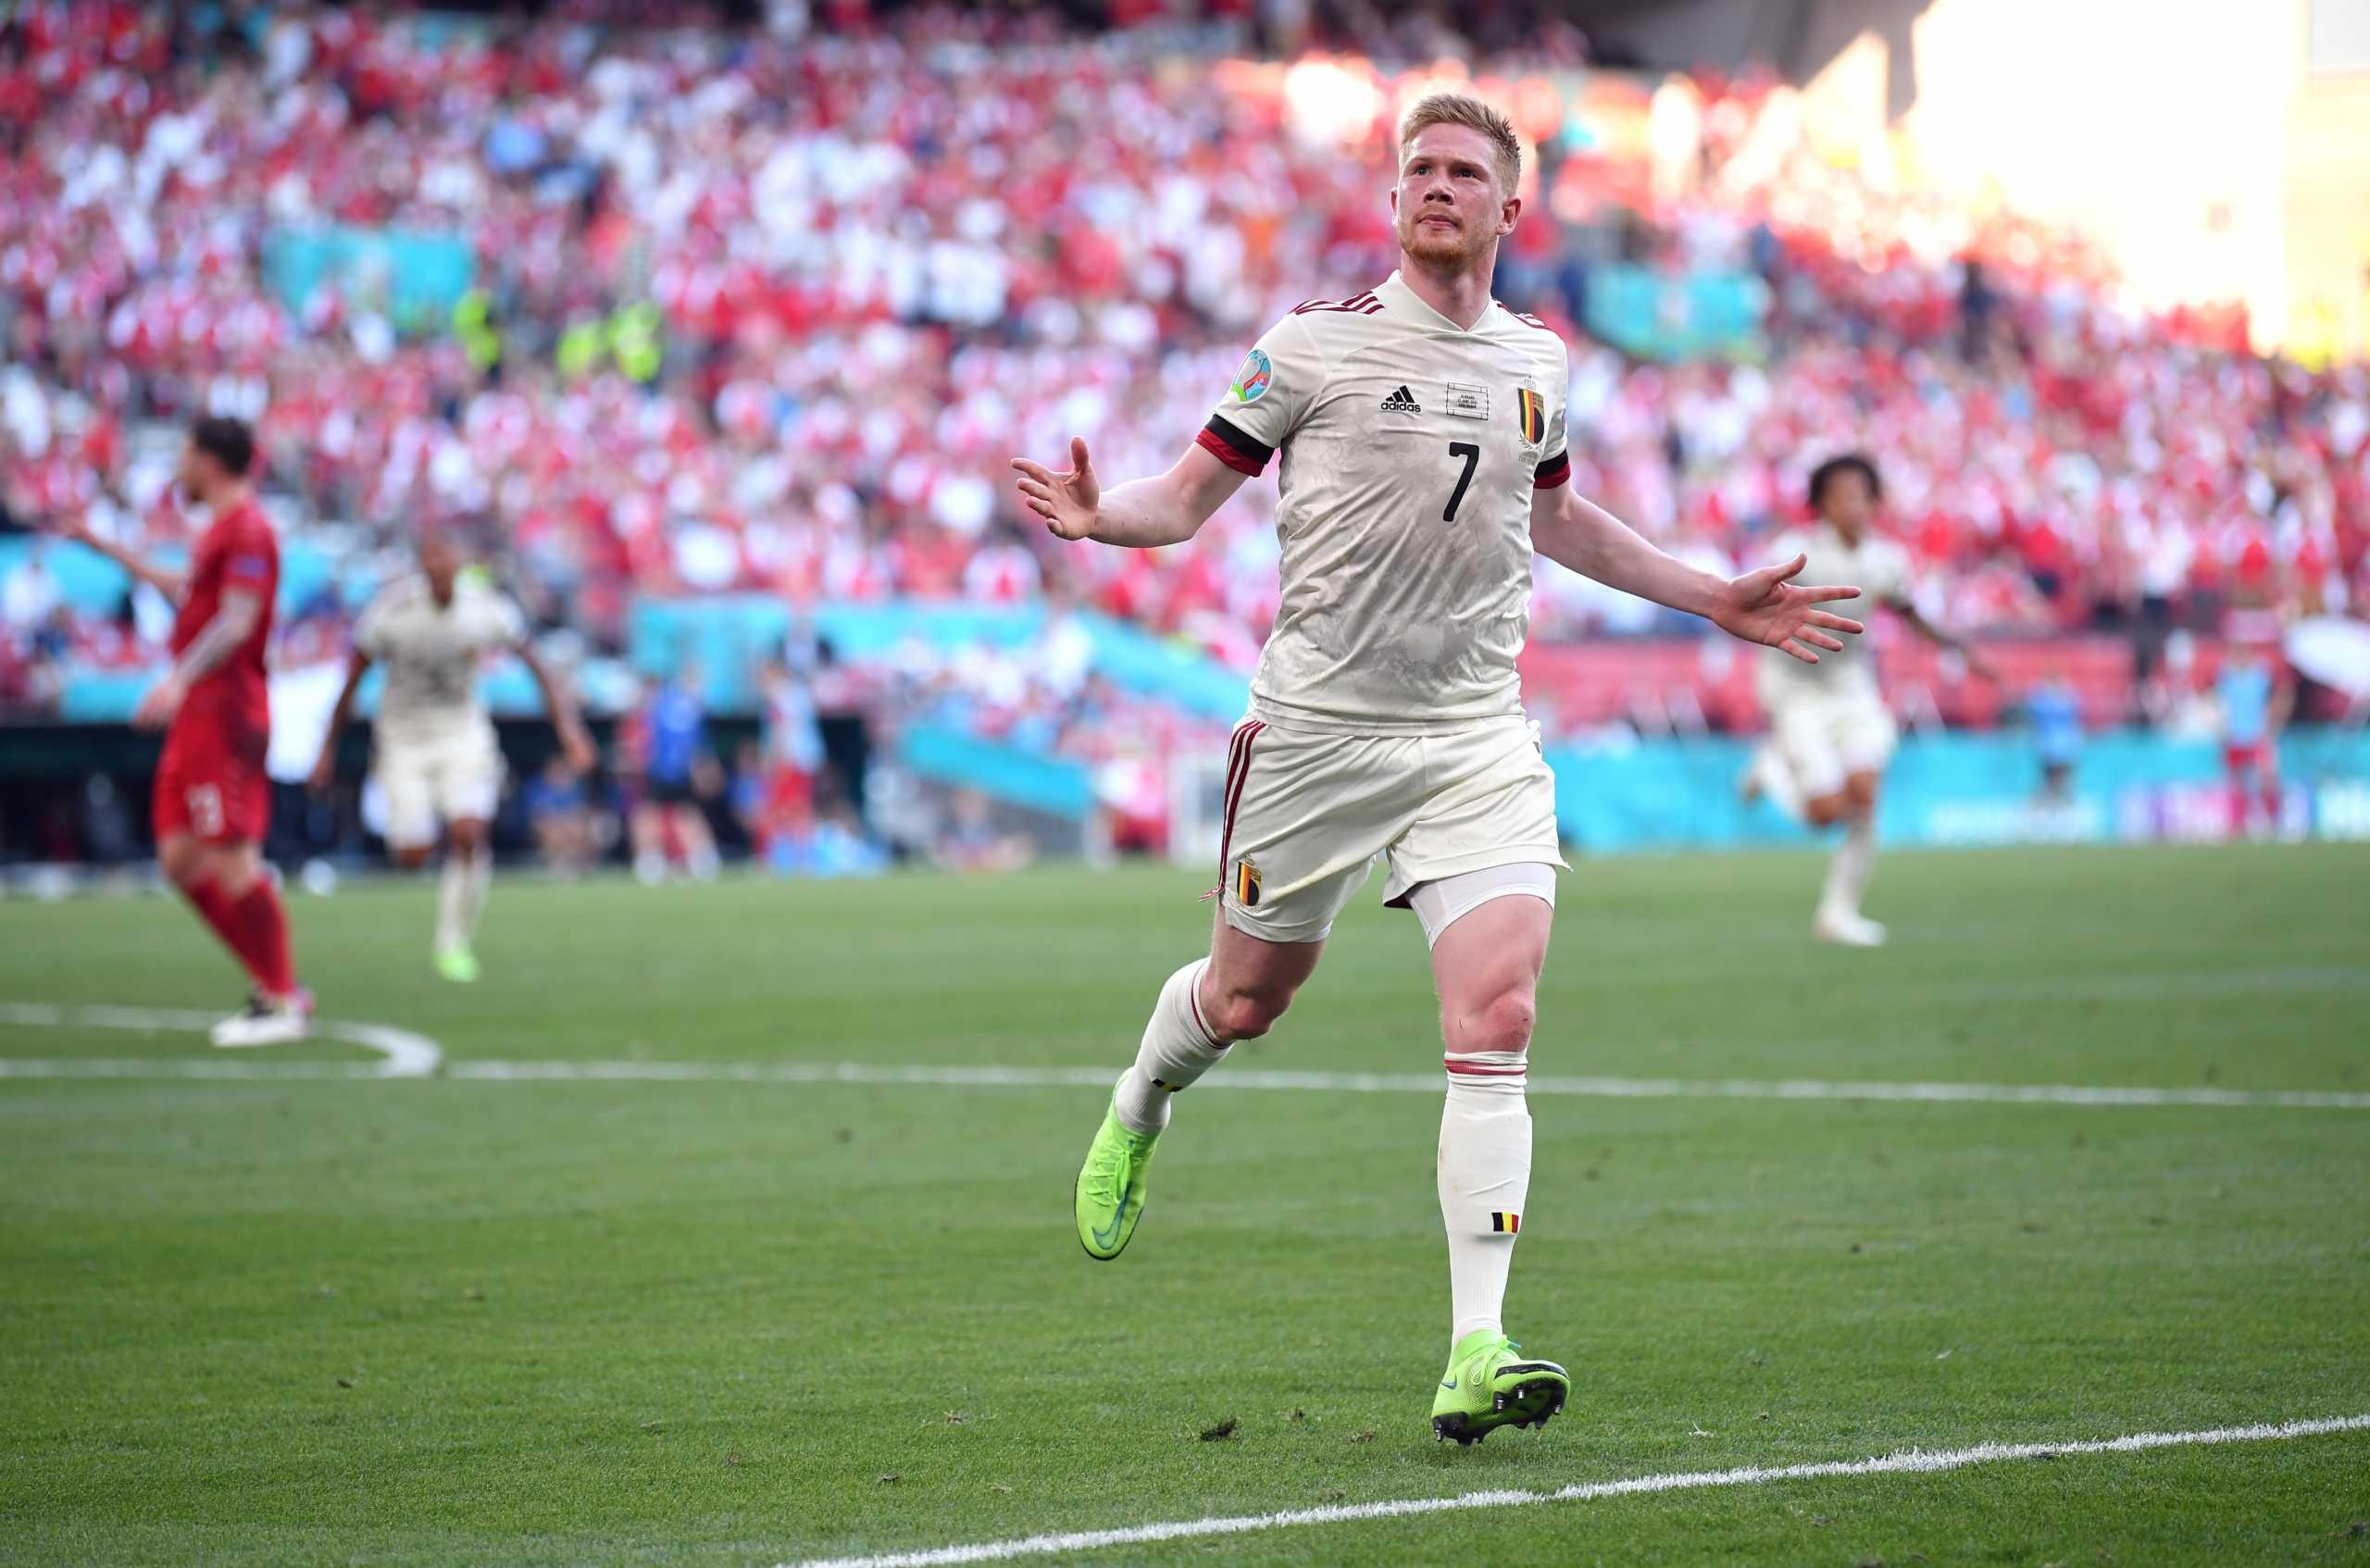 Euro 2020, Δανία – Βέλγιο 1-2: «Μυθικός» Ντε Μπρόινε οδήγησε σε ανατροπή